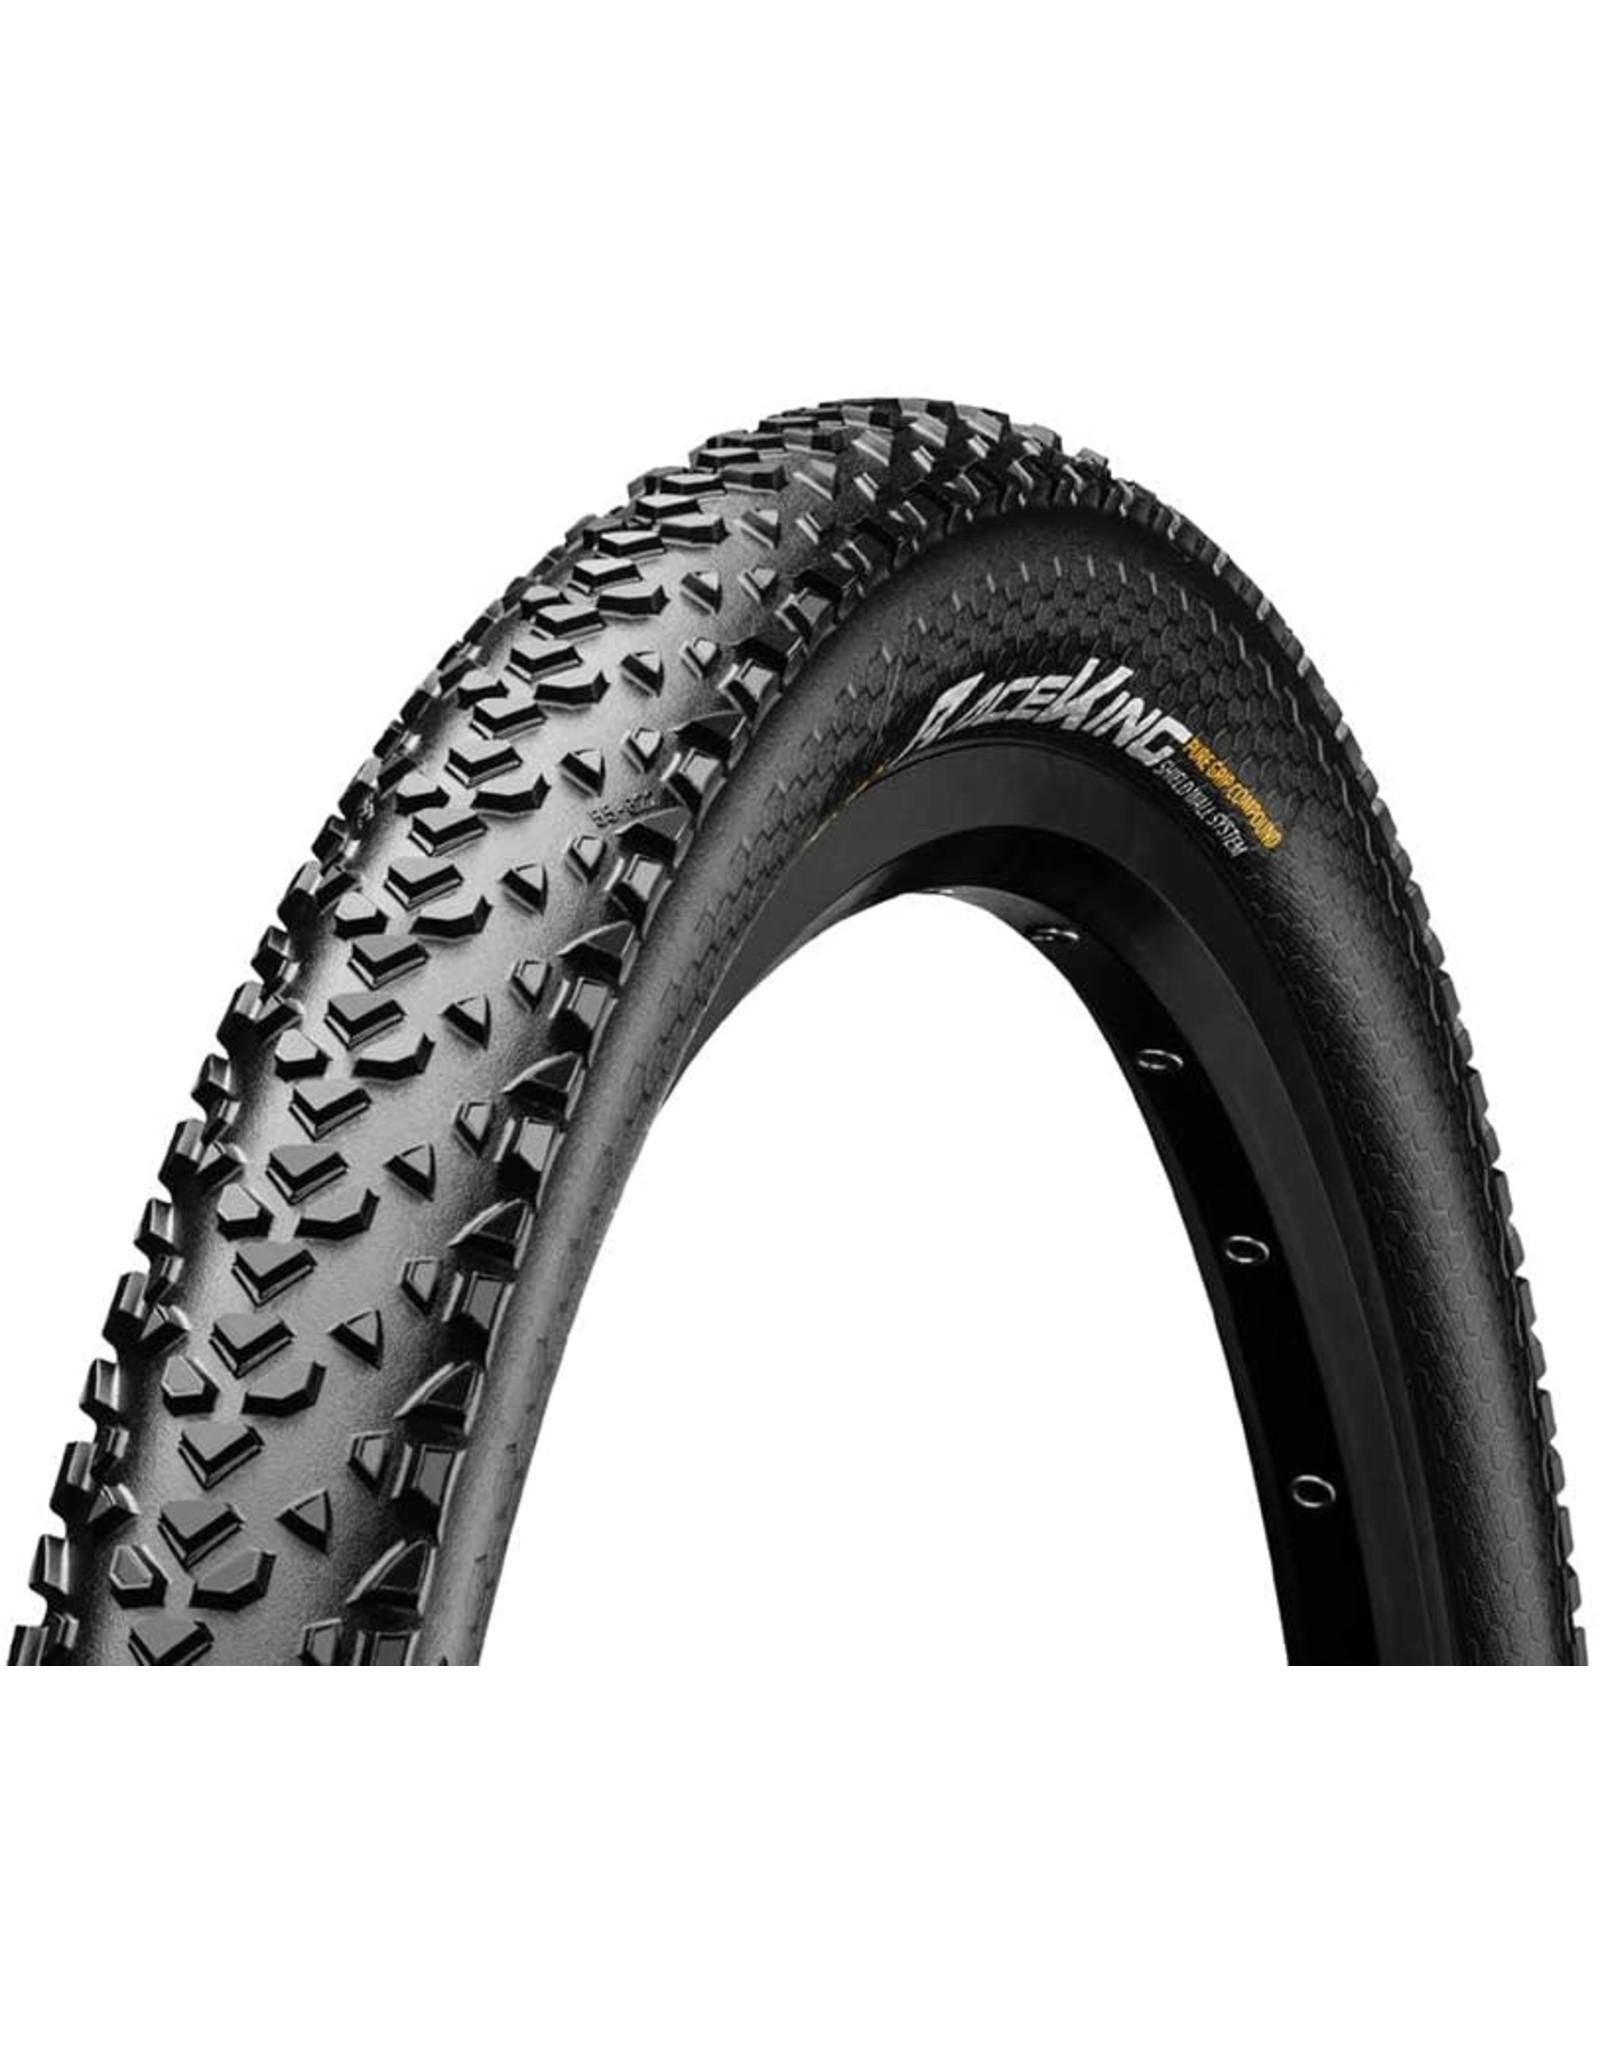 Continental Continental - XC/Enduro Tires Race King 27.5 x 2.2 ShieldWall Folding BW